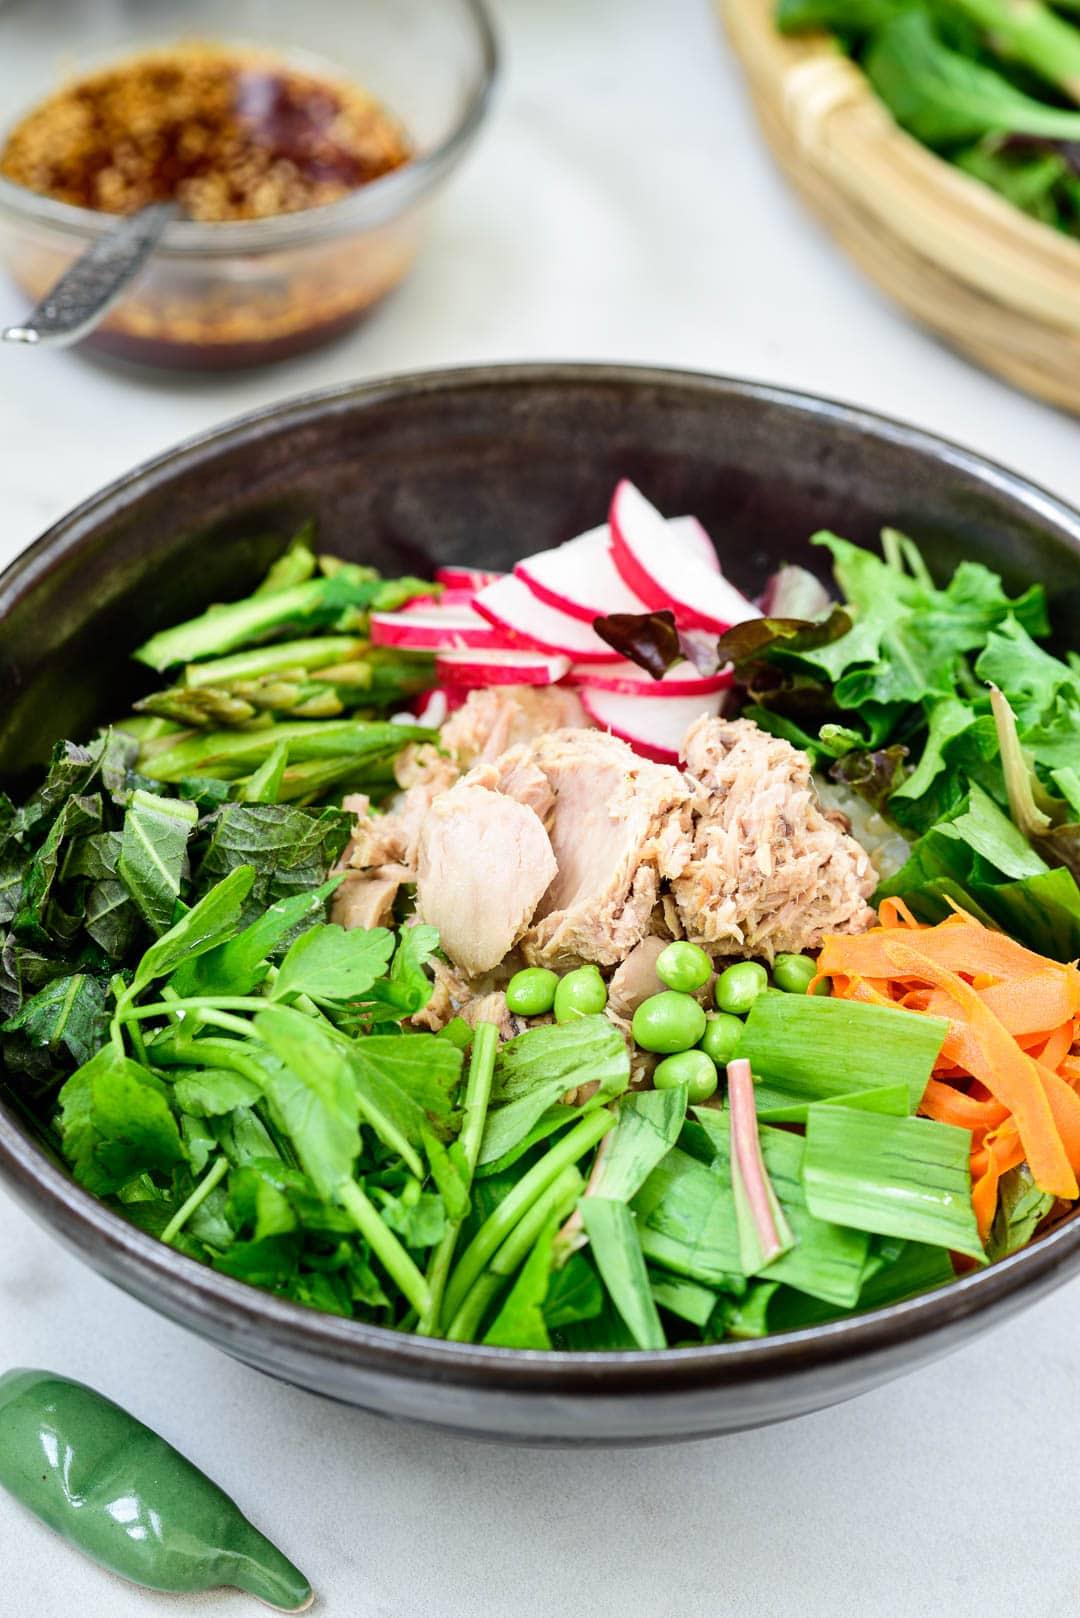 DSC9306 2 - Tuna Bibimbap with Spring Vegetables